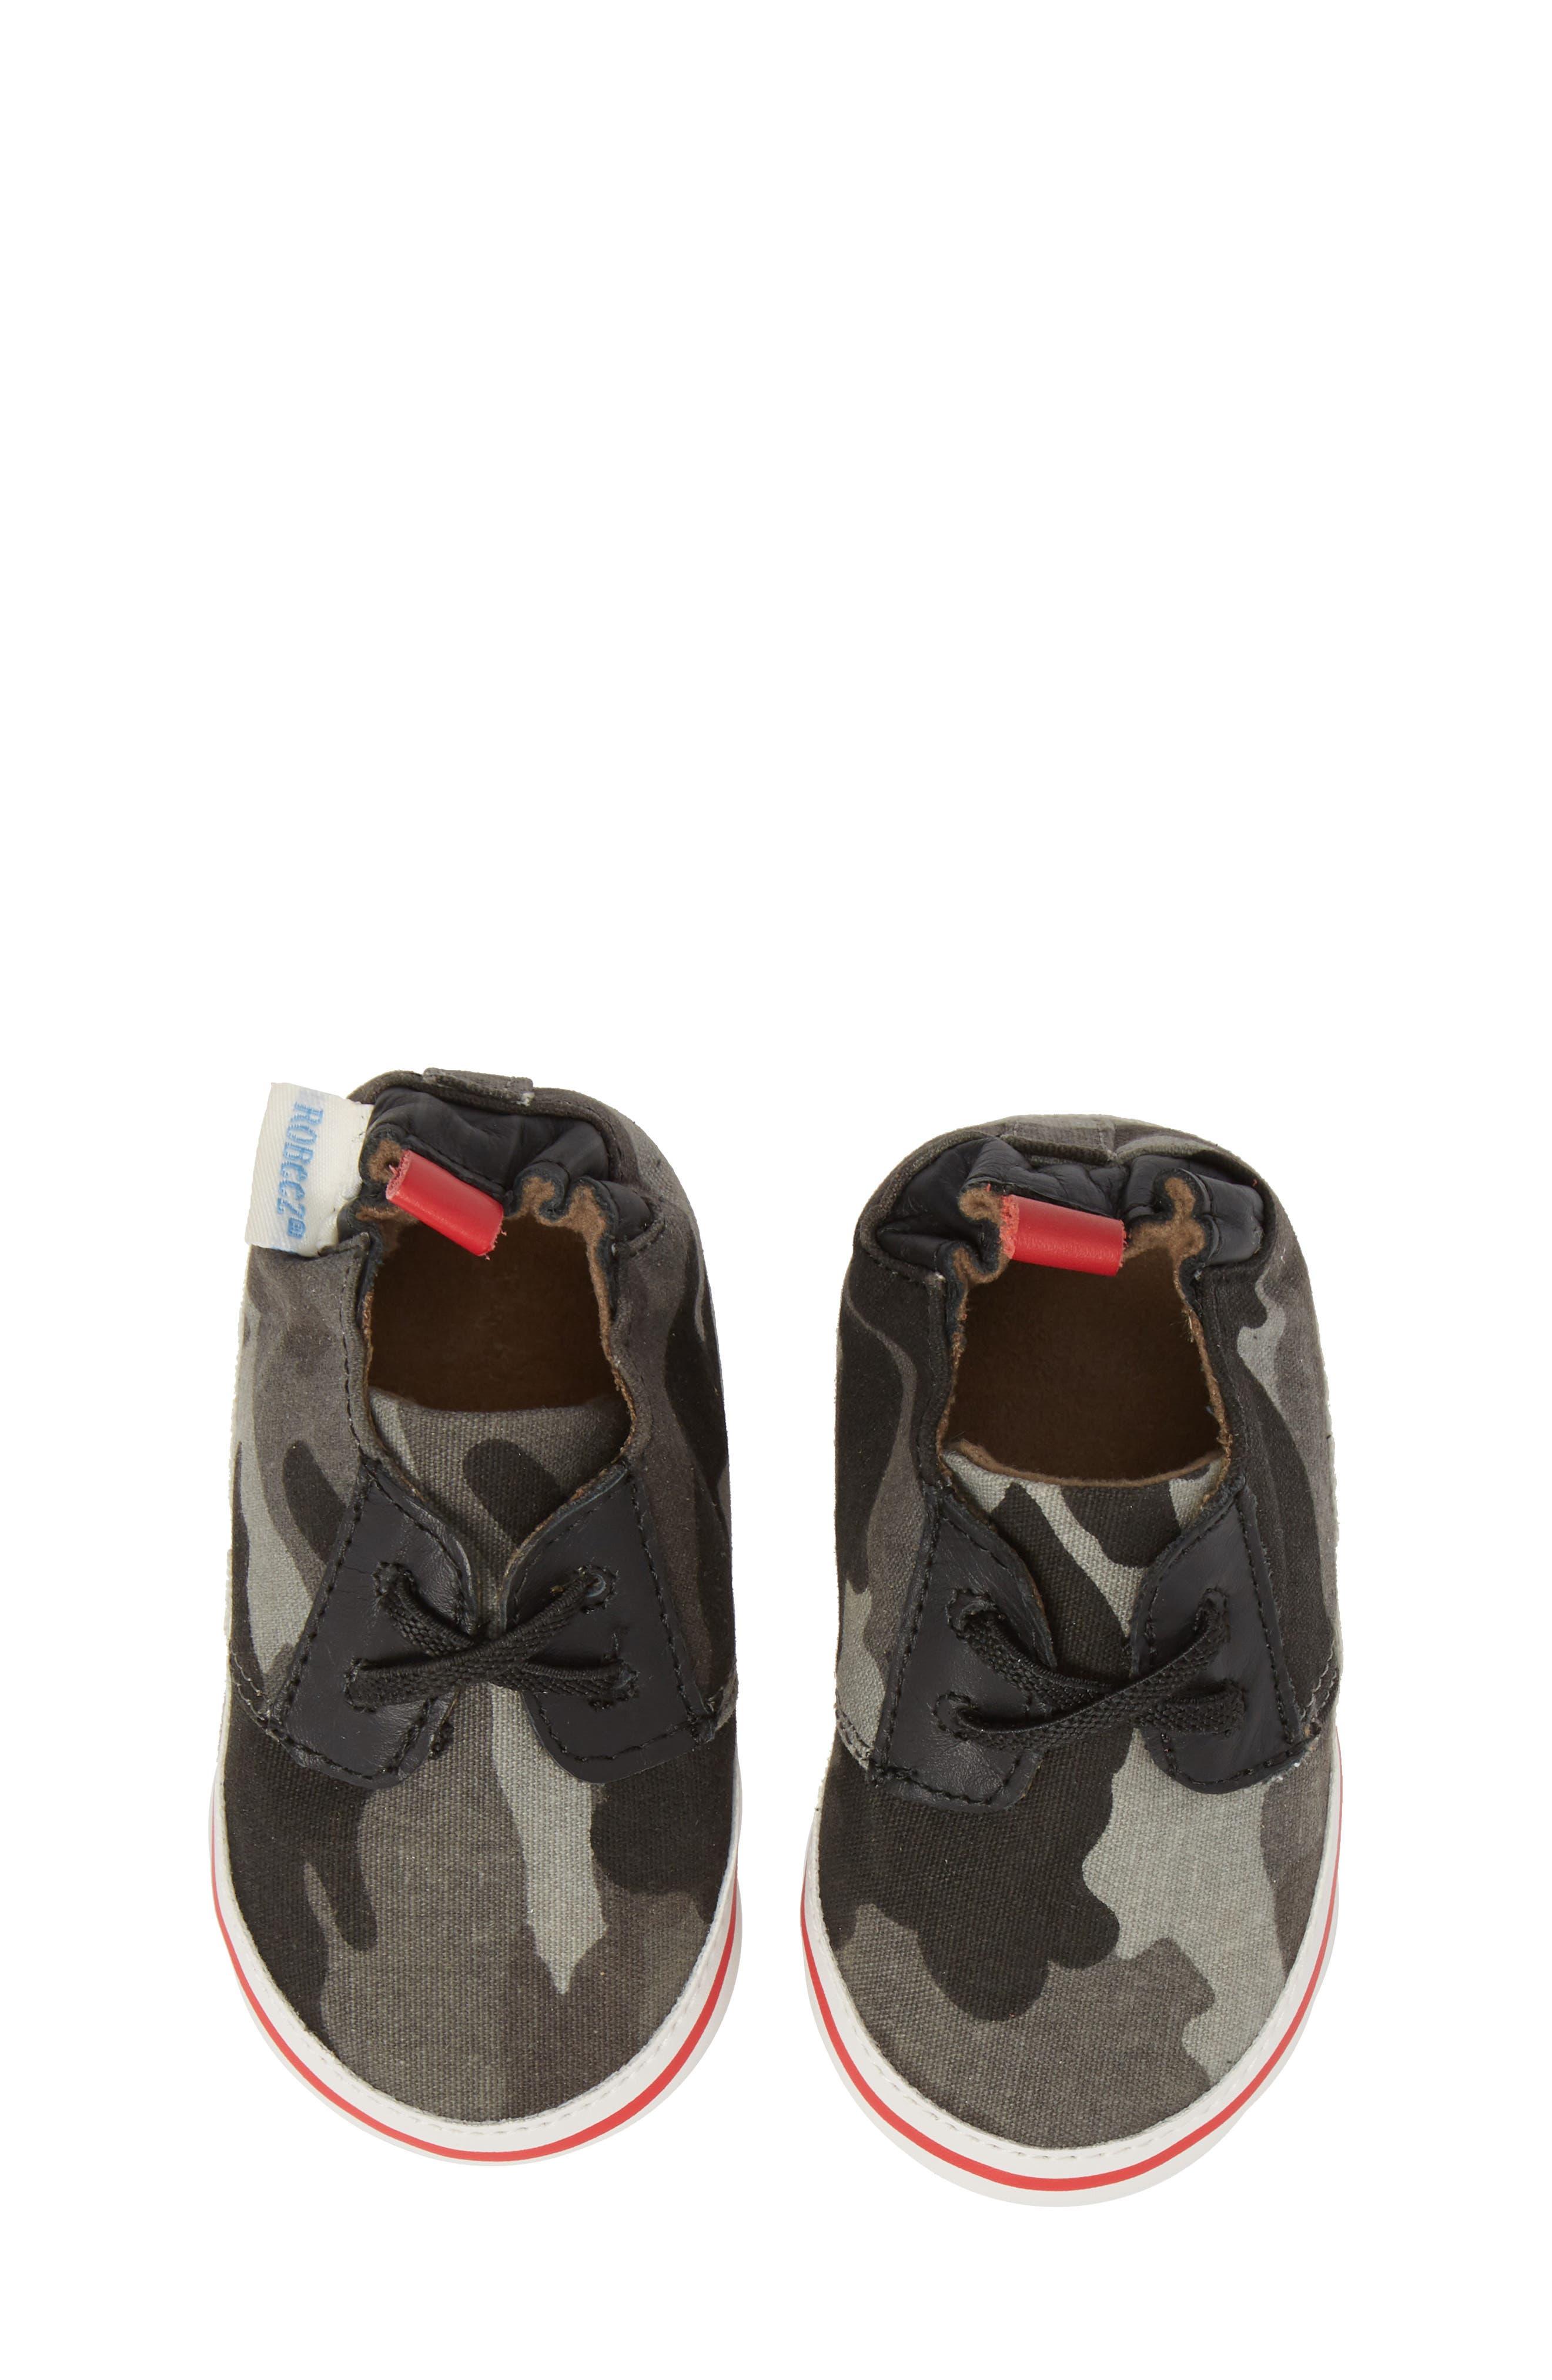 Cool & Casual Camo Print Crib Shoe,                             Alternate thumbnail 5, color,                             020